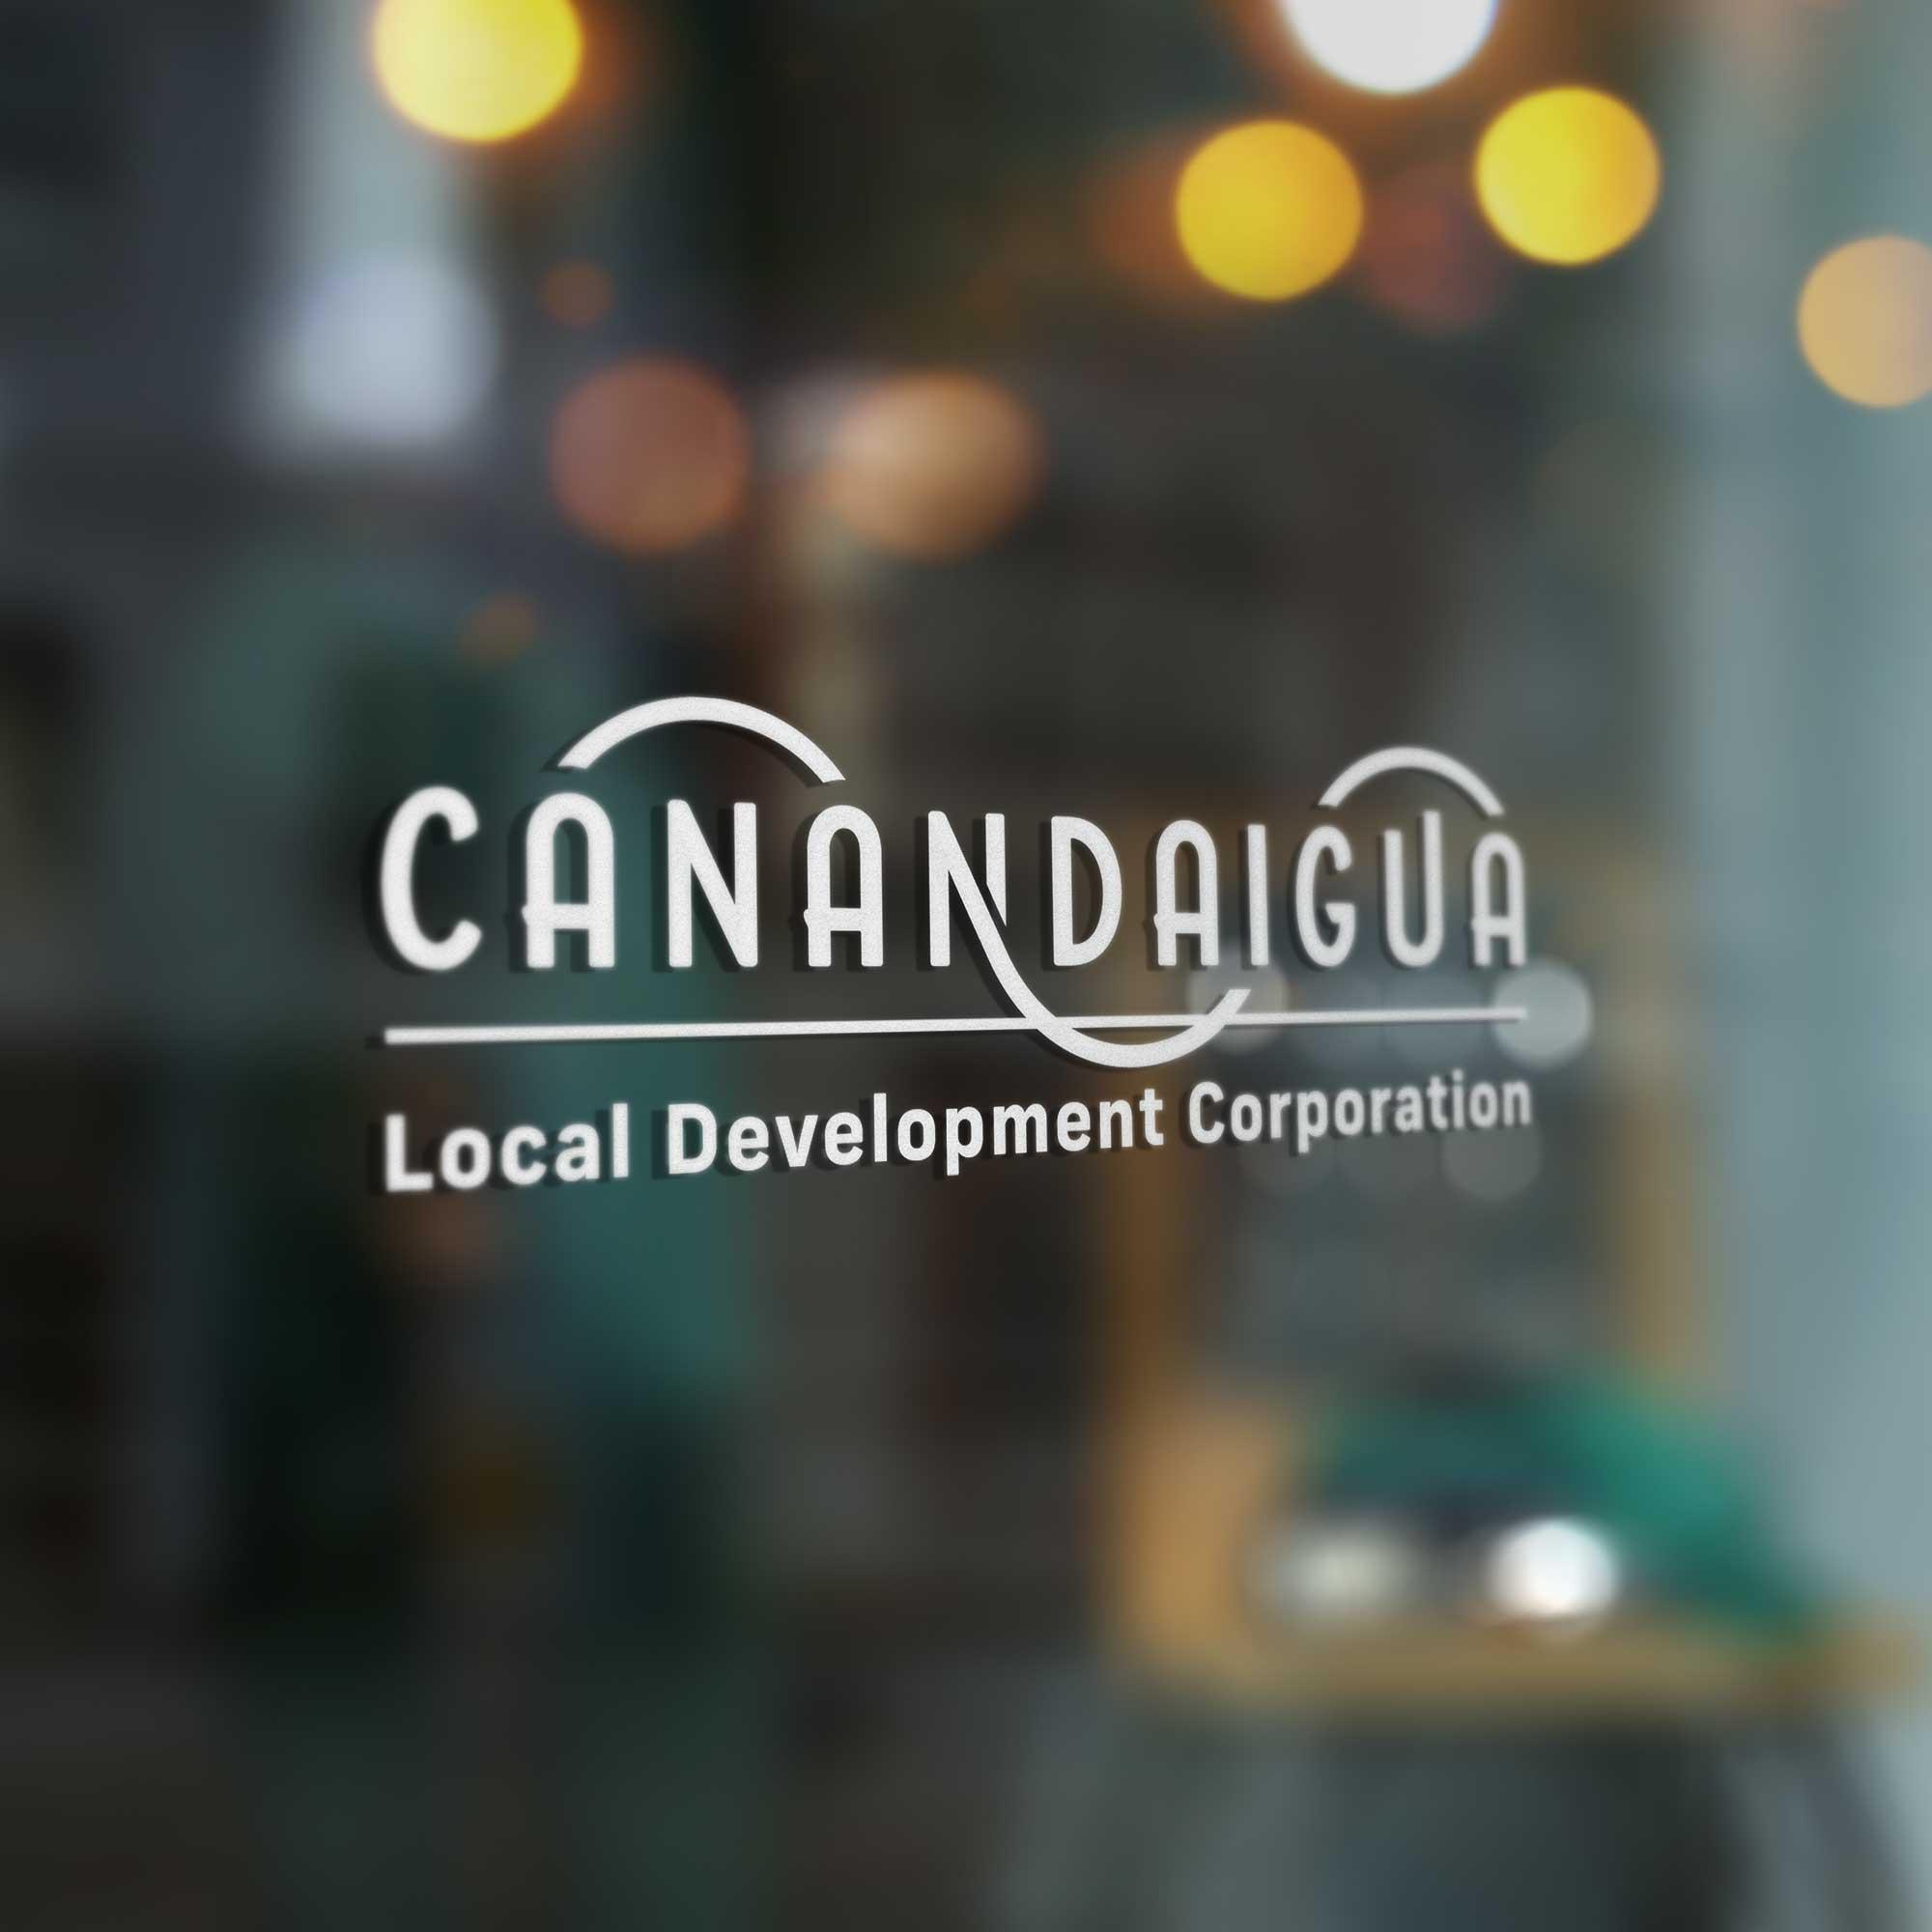 Canandaigua Local Development Corporation